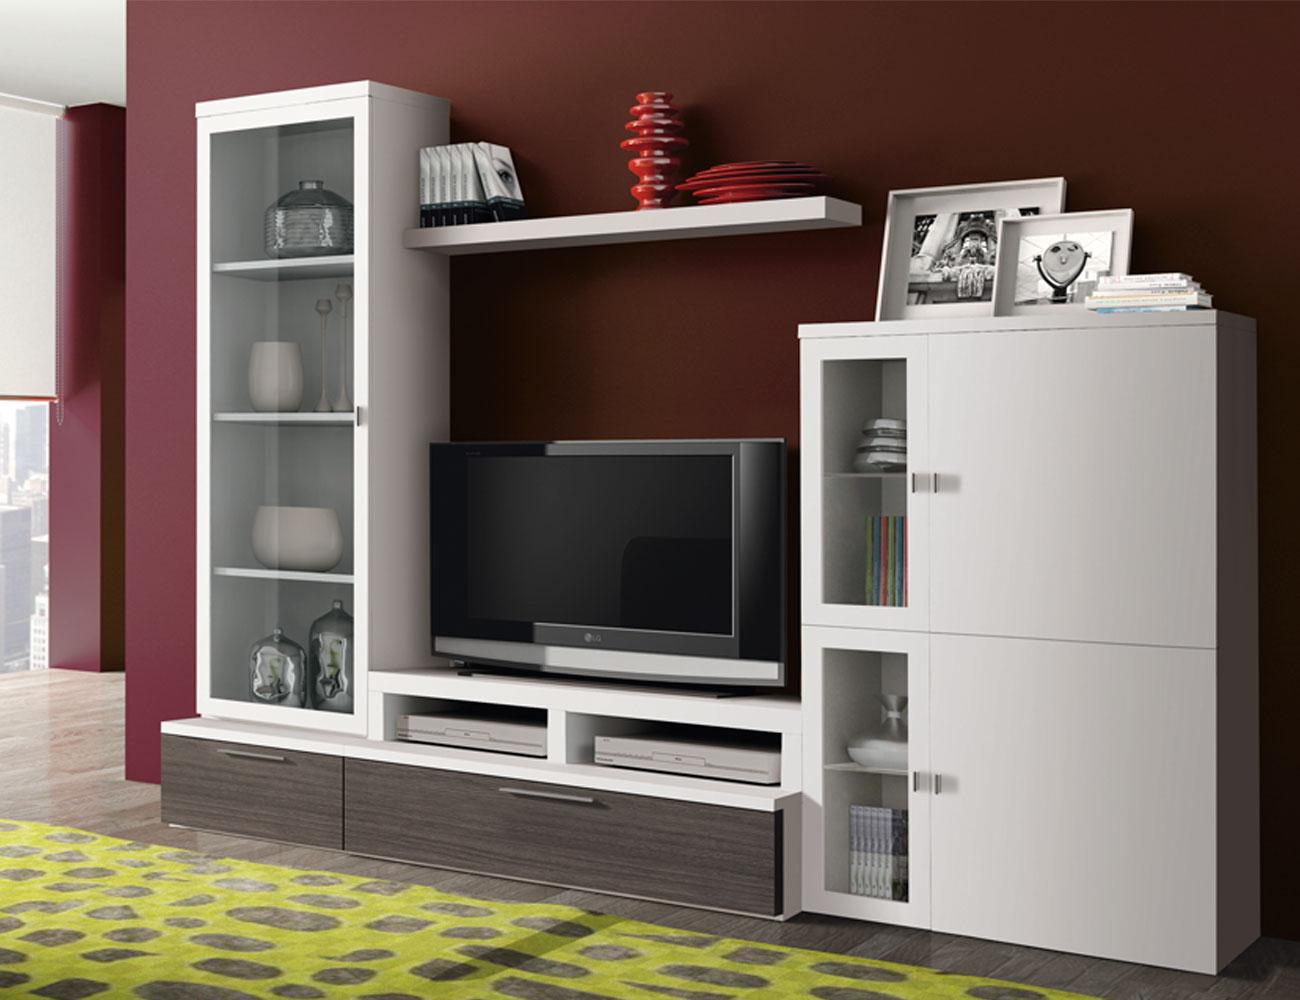 718 mueble salon comedor blanco ceniza